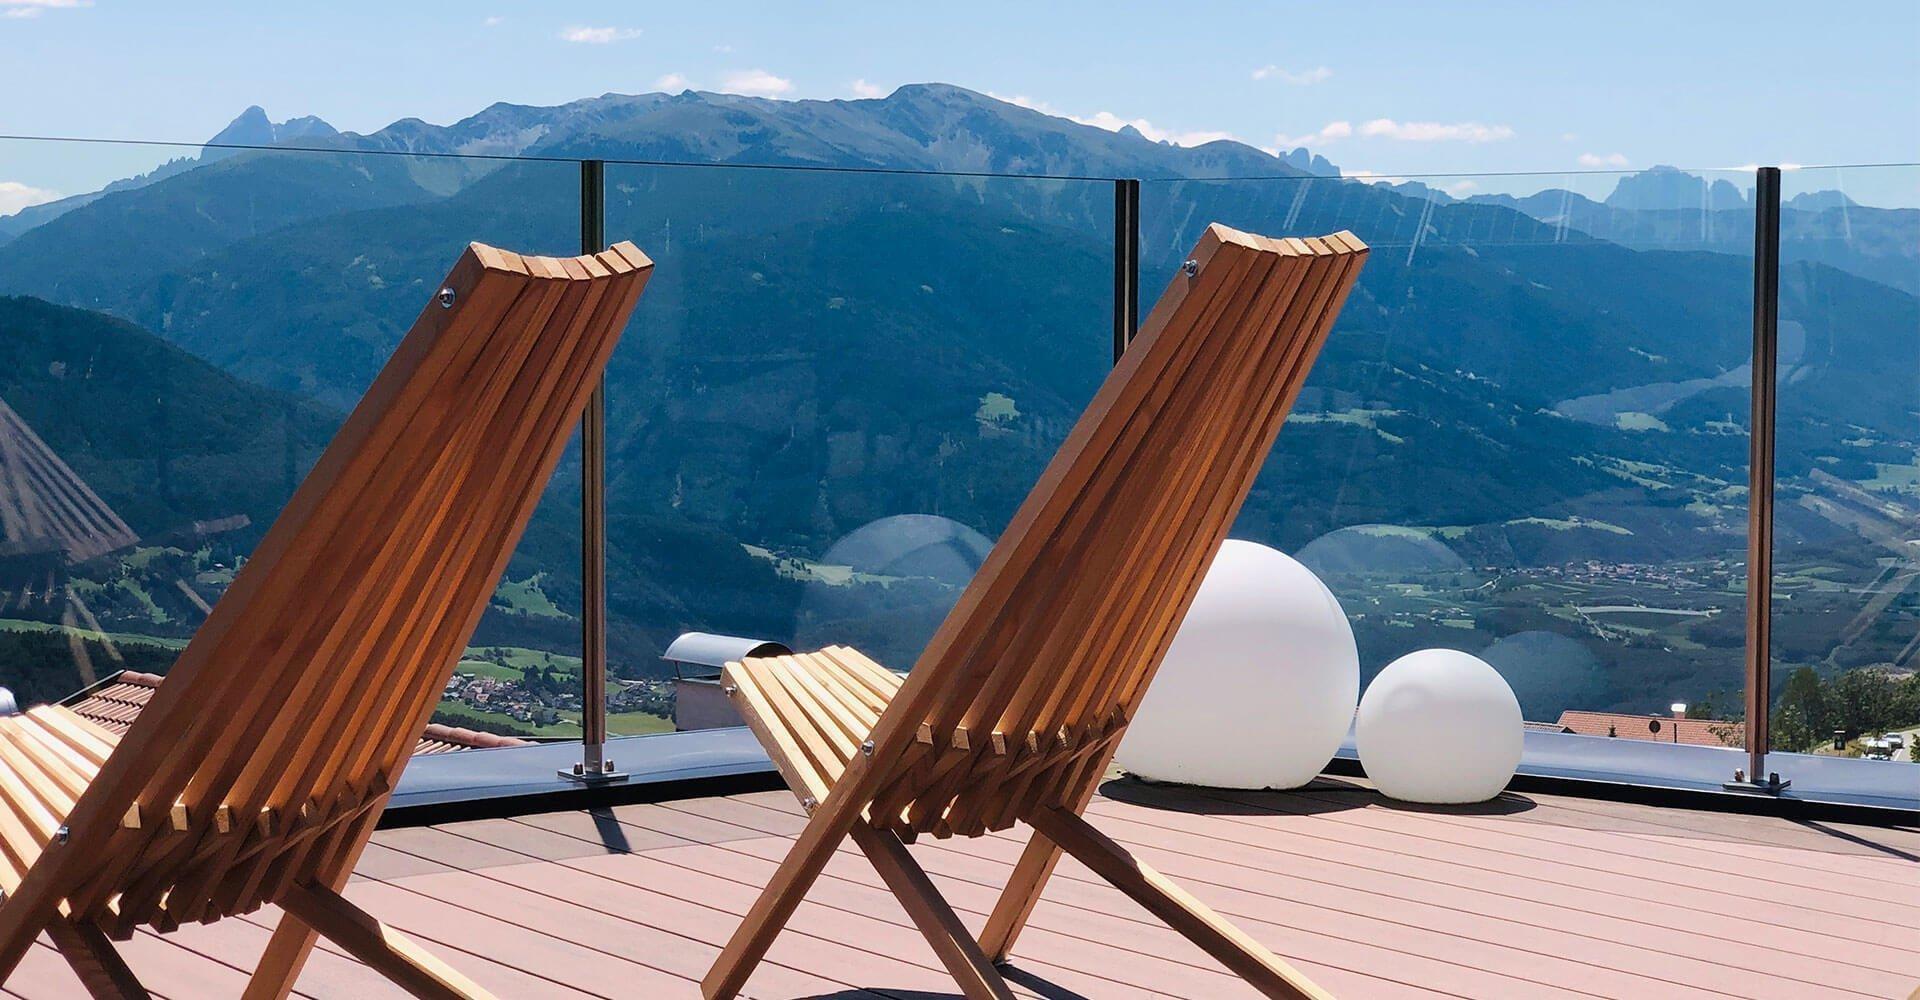 Hotel Kristall in Meransen Gitschberg-Jochtal | Wanderurlaub in den Dolomiten